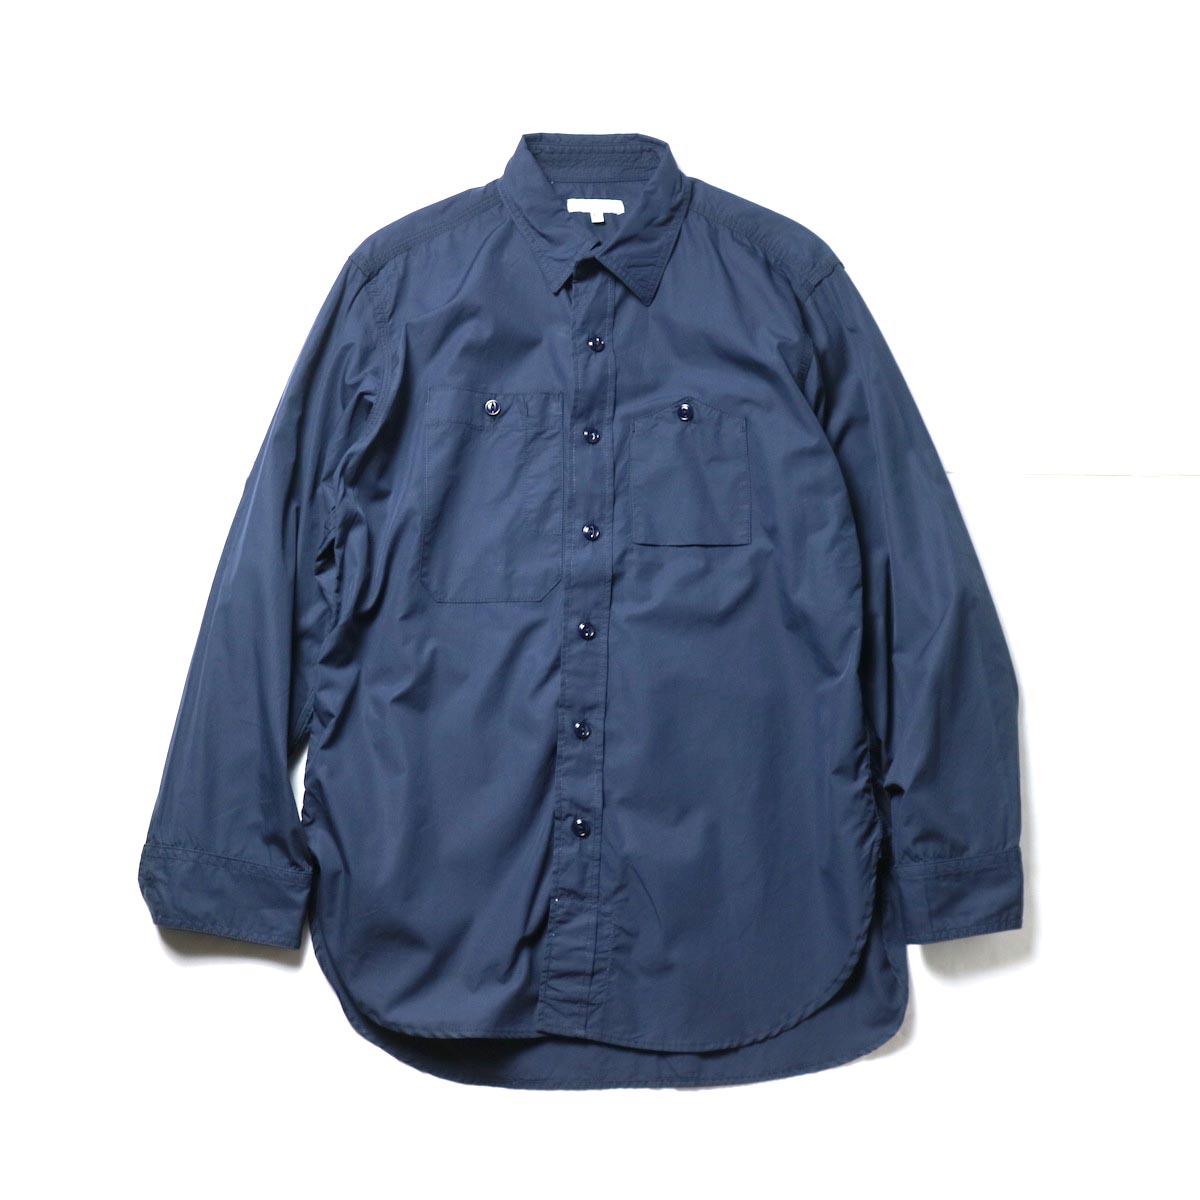 Engineered Garments / Banded Collar Shirt -100's 2Ply Broadcloth (Dk.Navy)